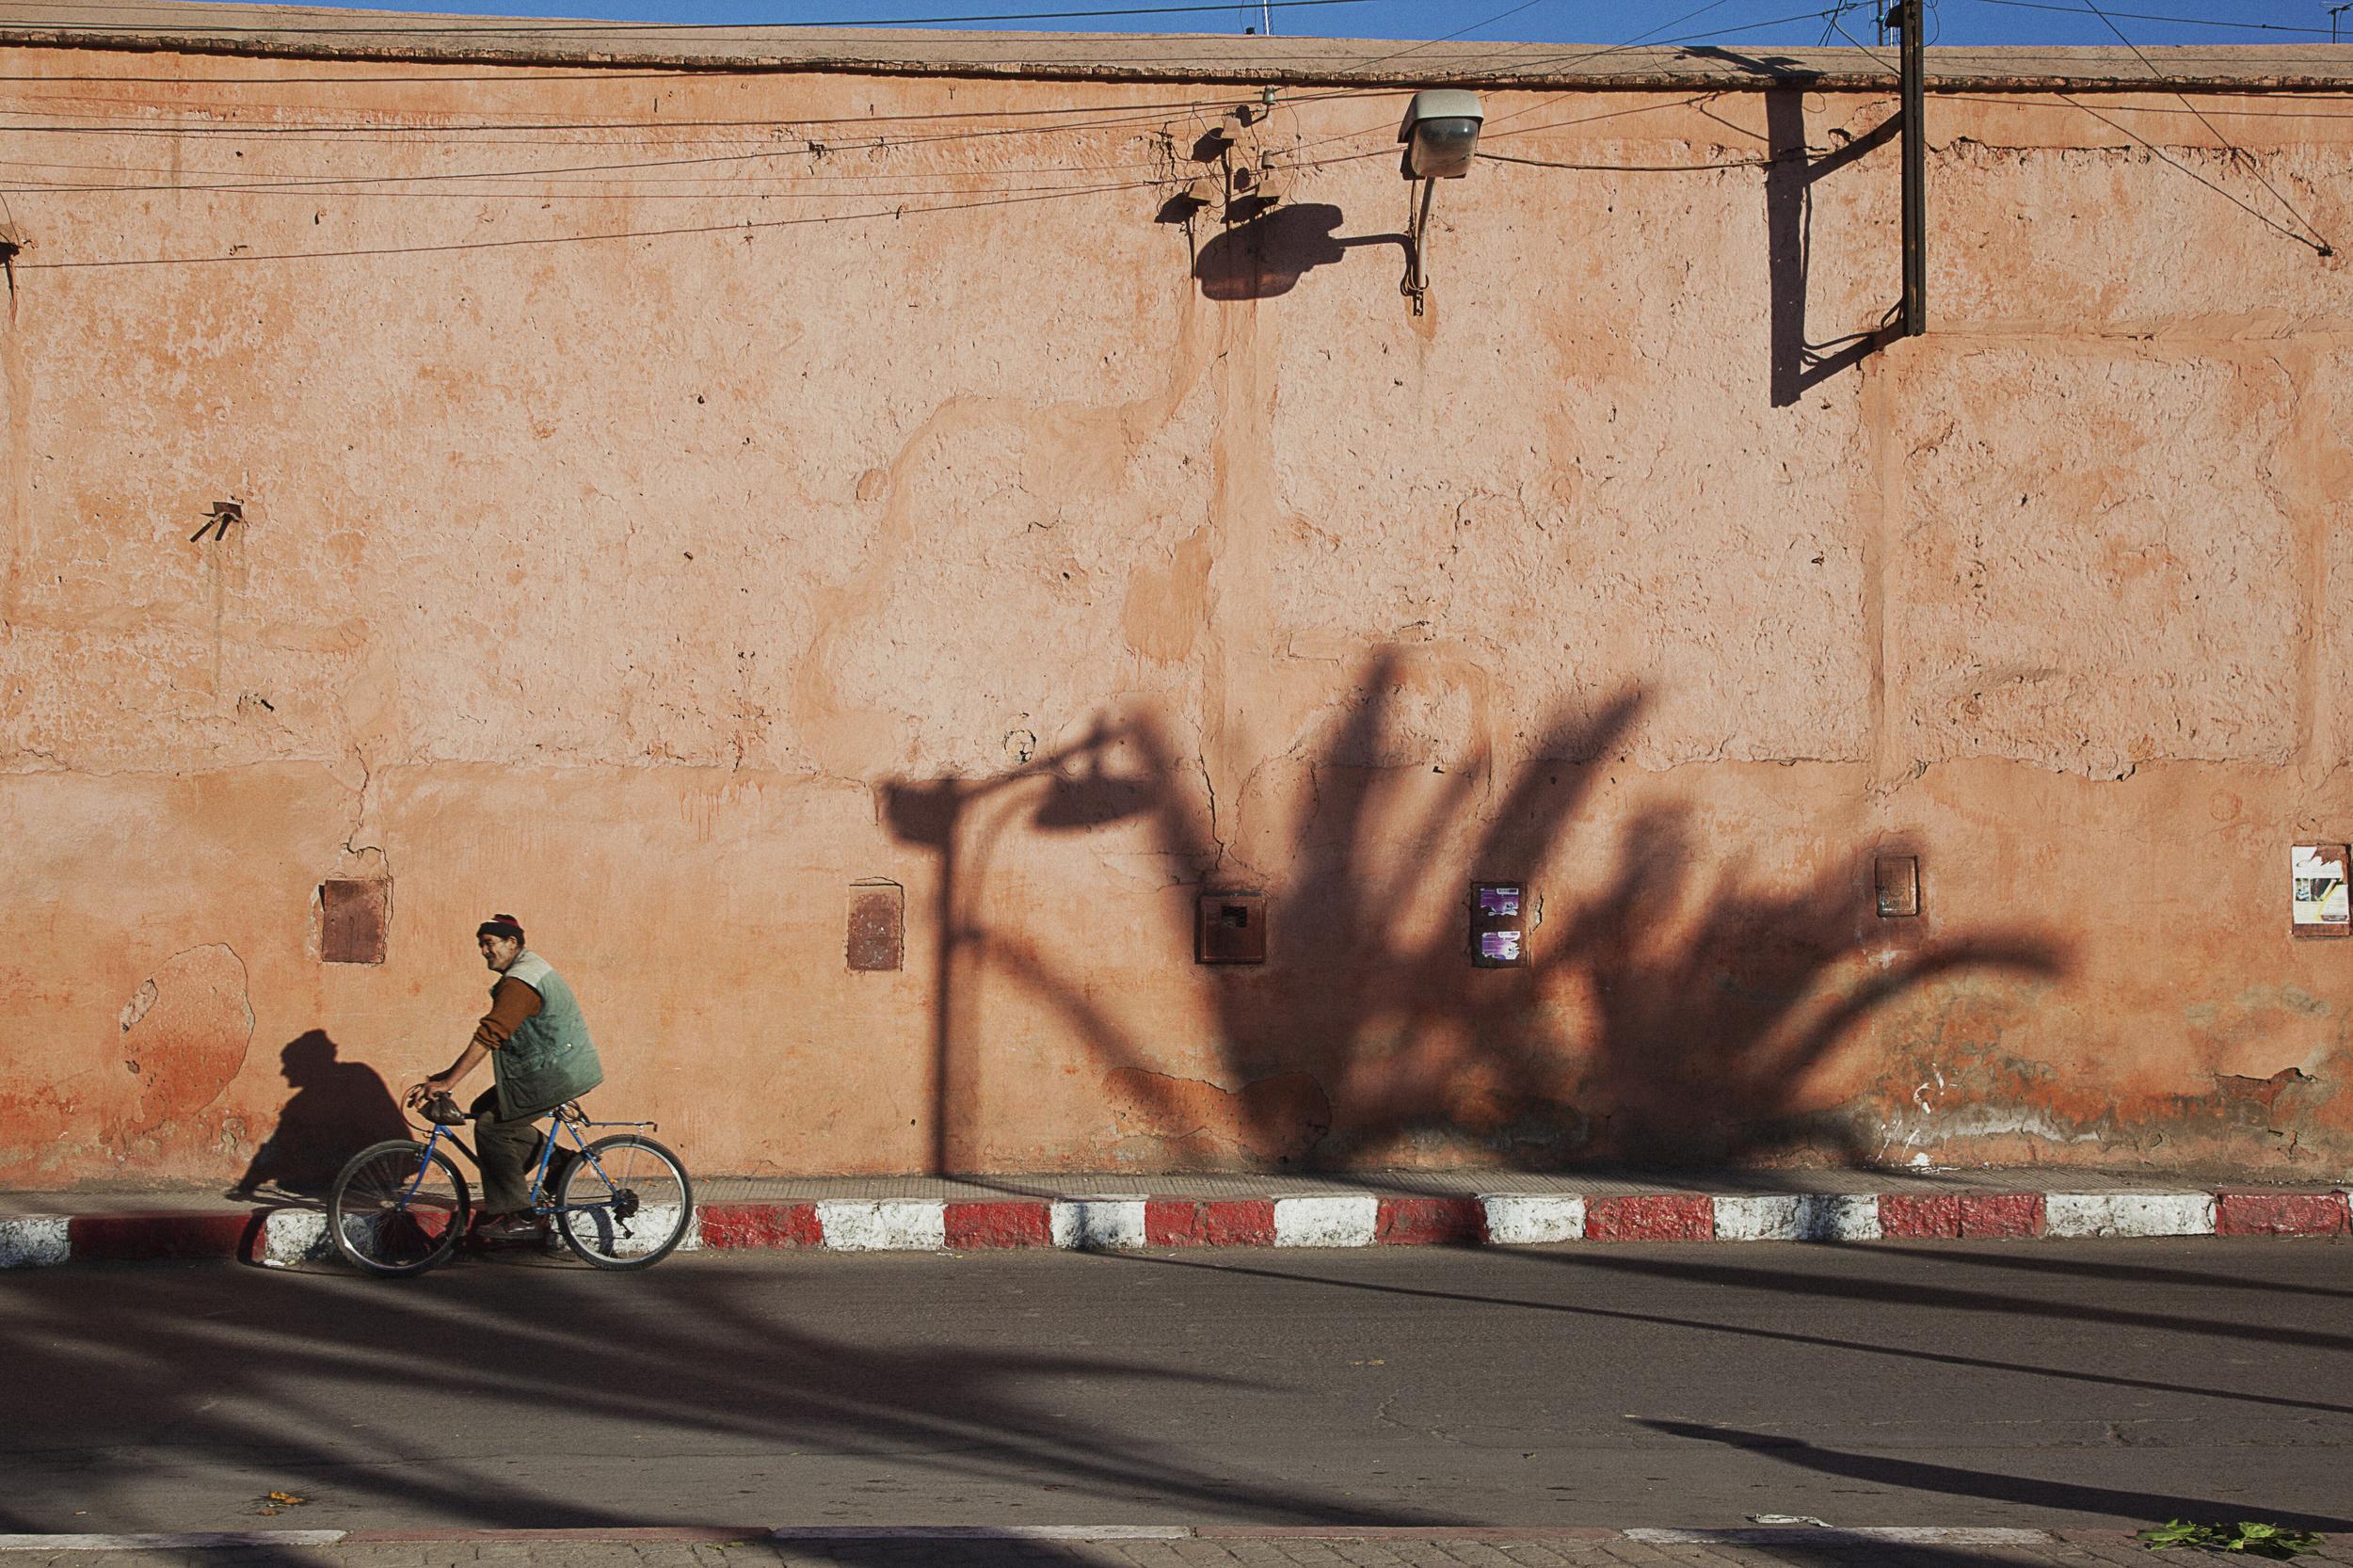 man-biking-in-marrkesh-travel-photographer.jpg